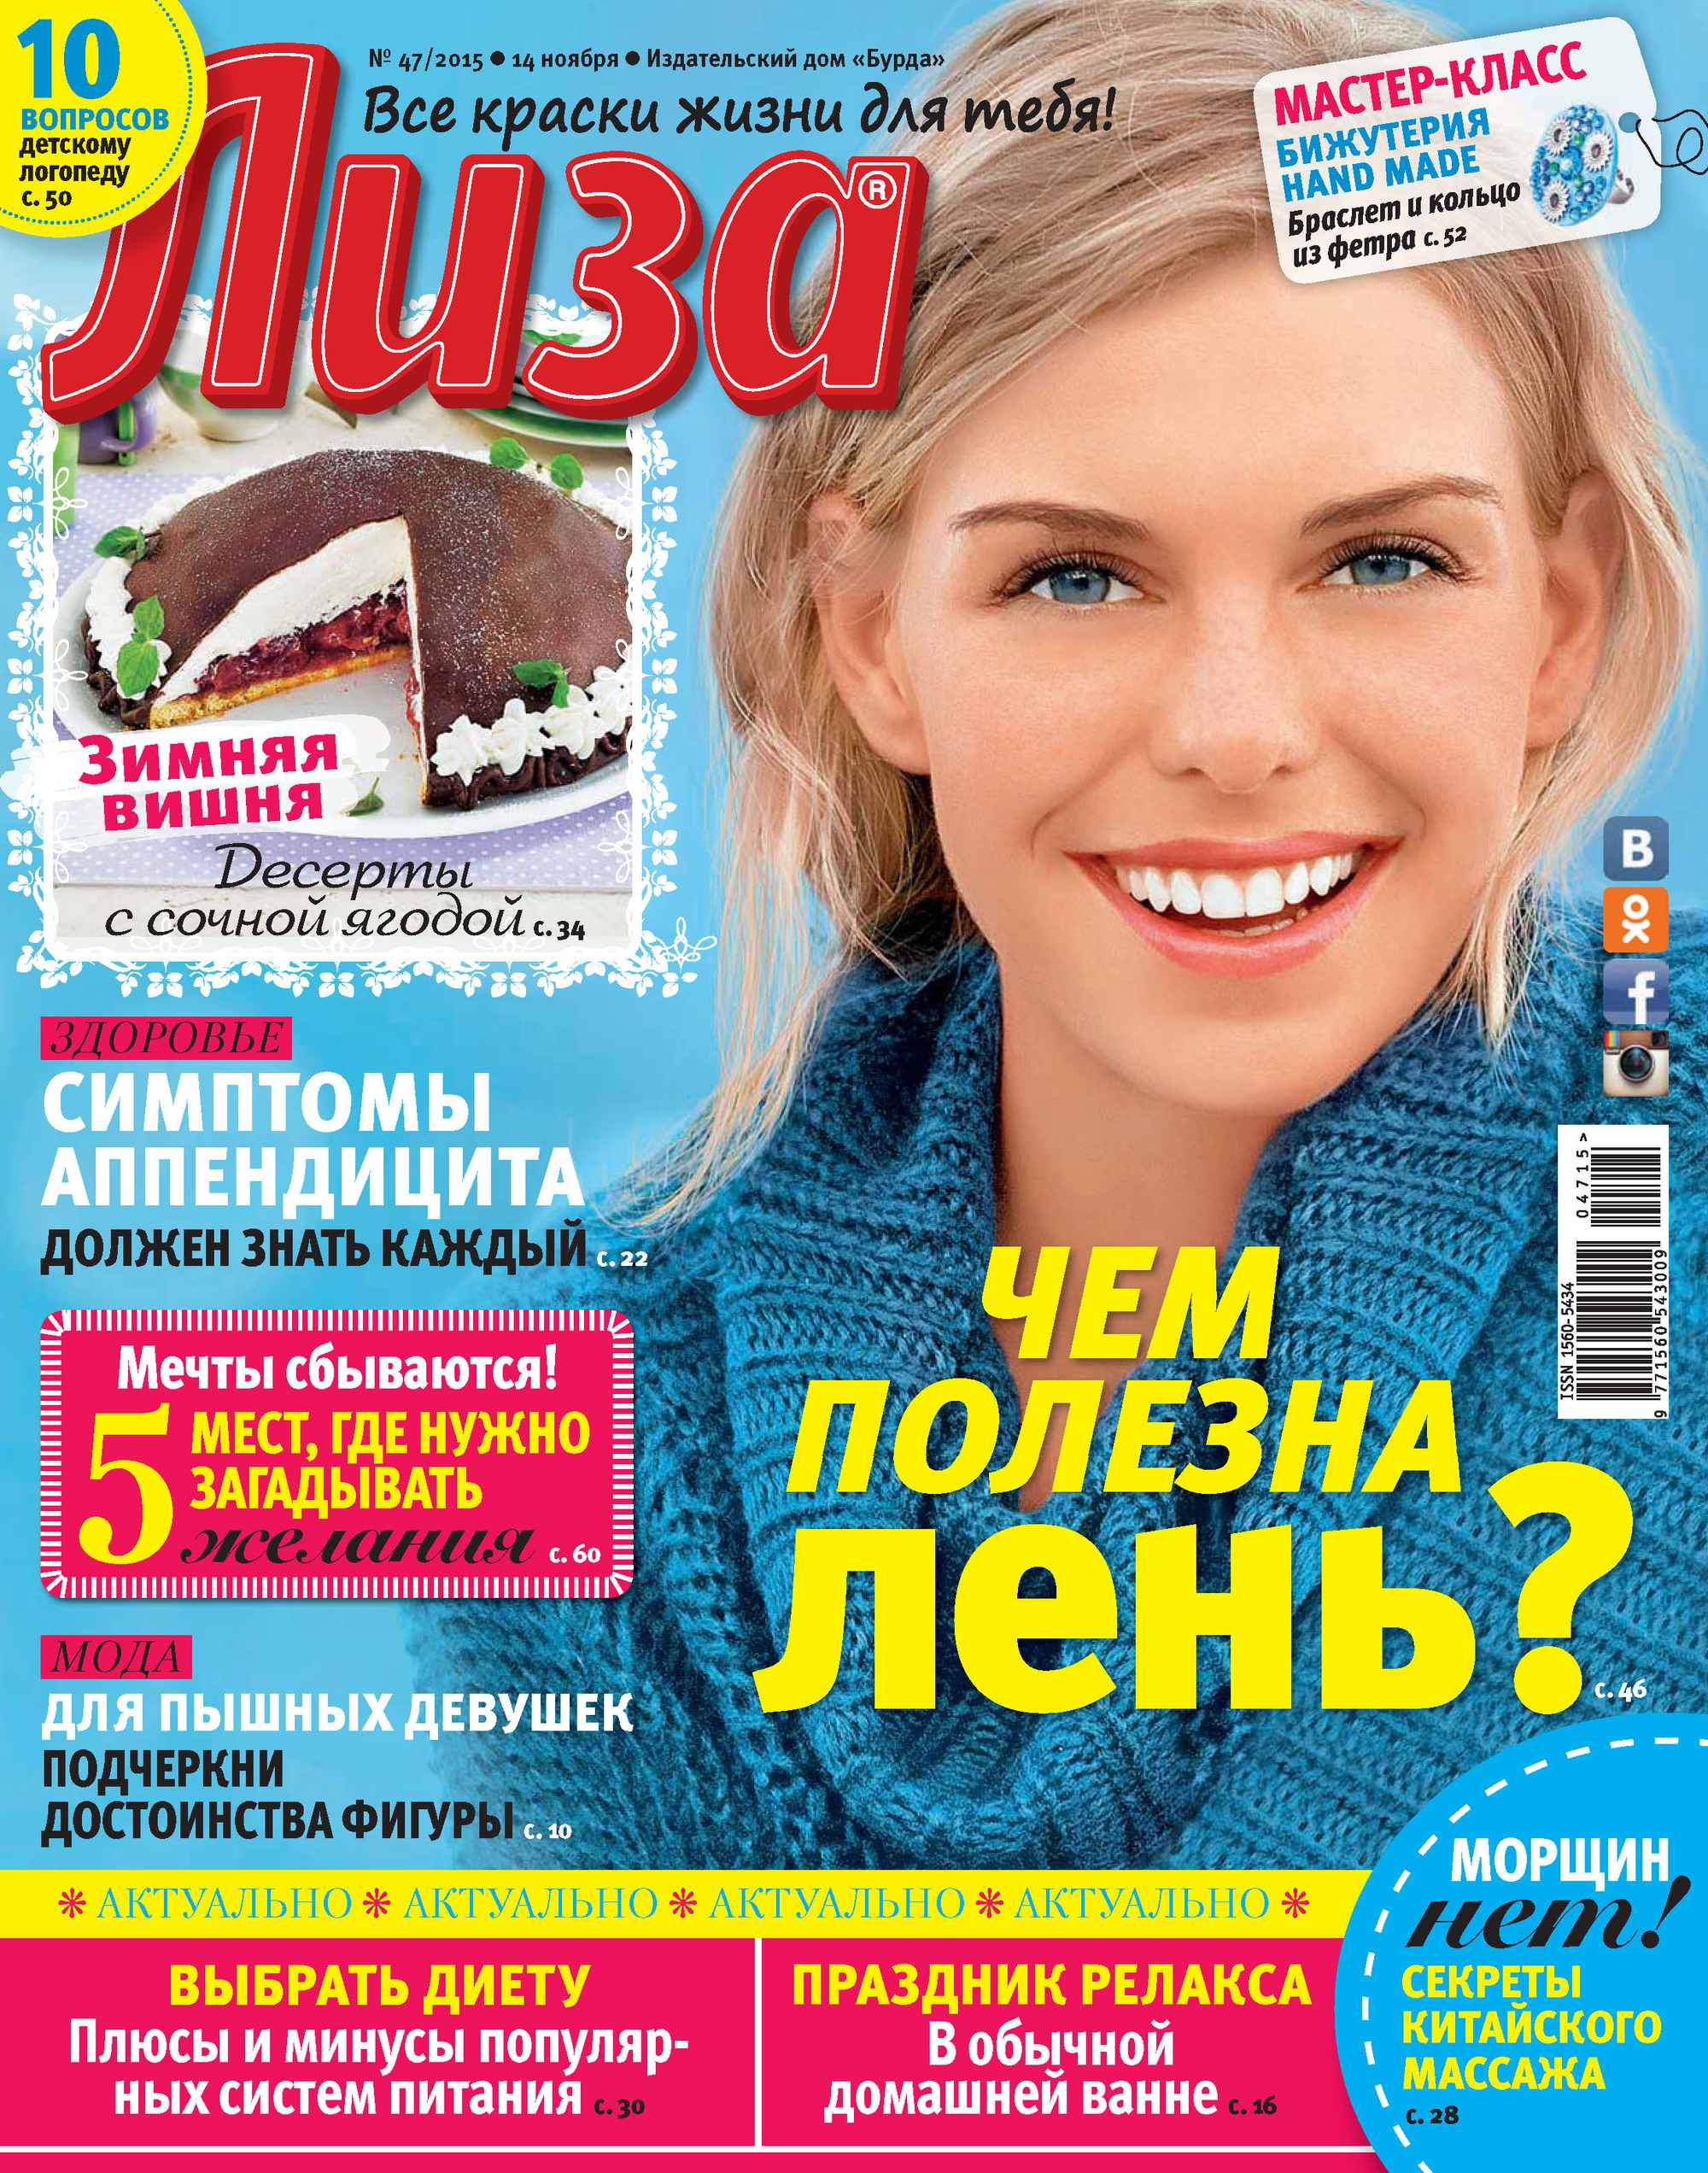 ИД «Бурда» Журнал «Лиза» №47/2015 ид бурда журнал лиза 49 2015